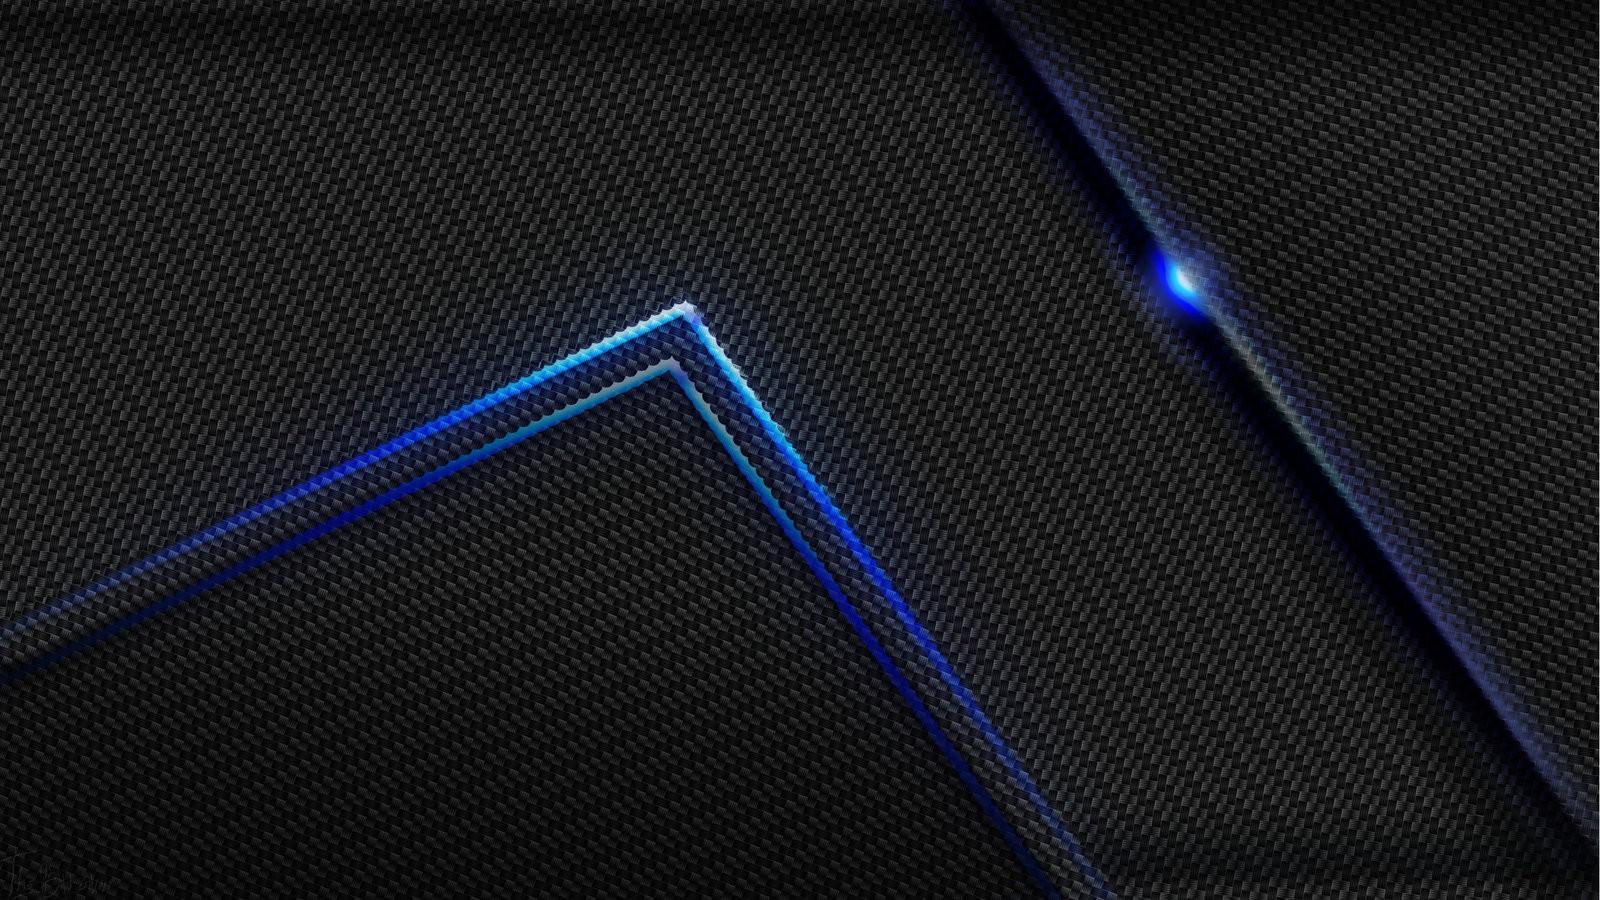 Black Carbon Wallpapers 1 2 APK Download - Android Персонализация